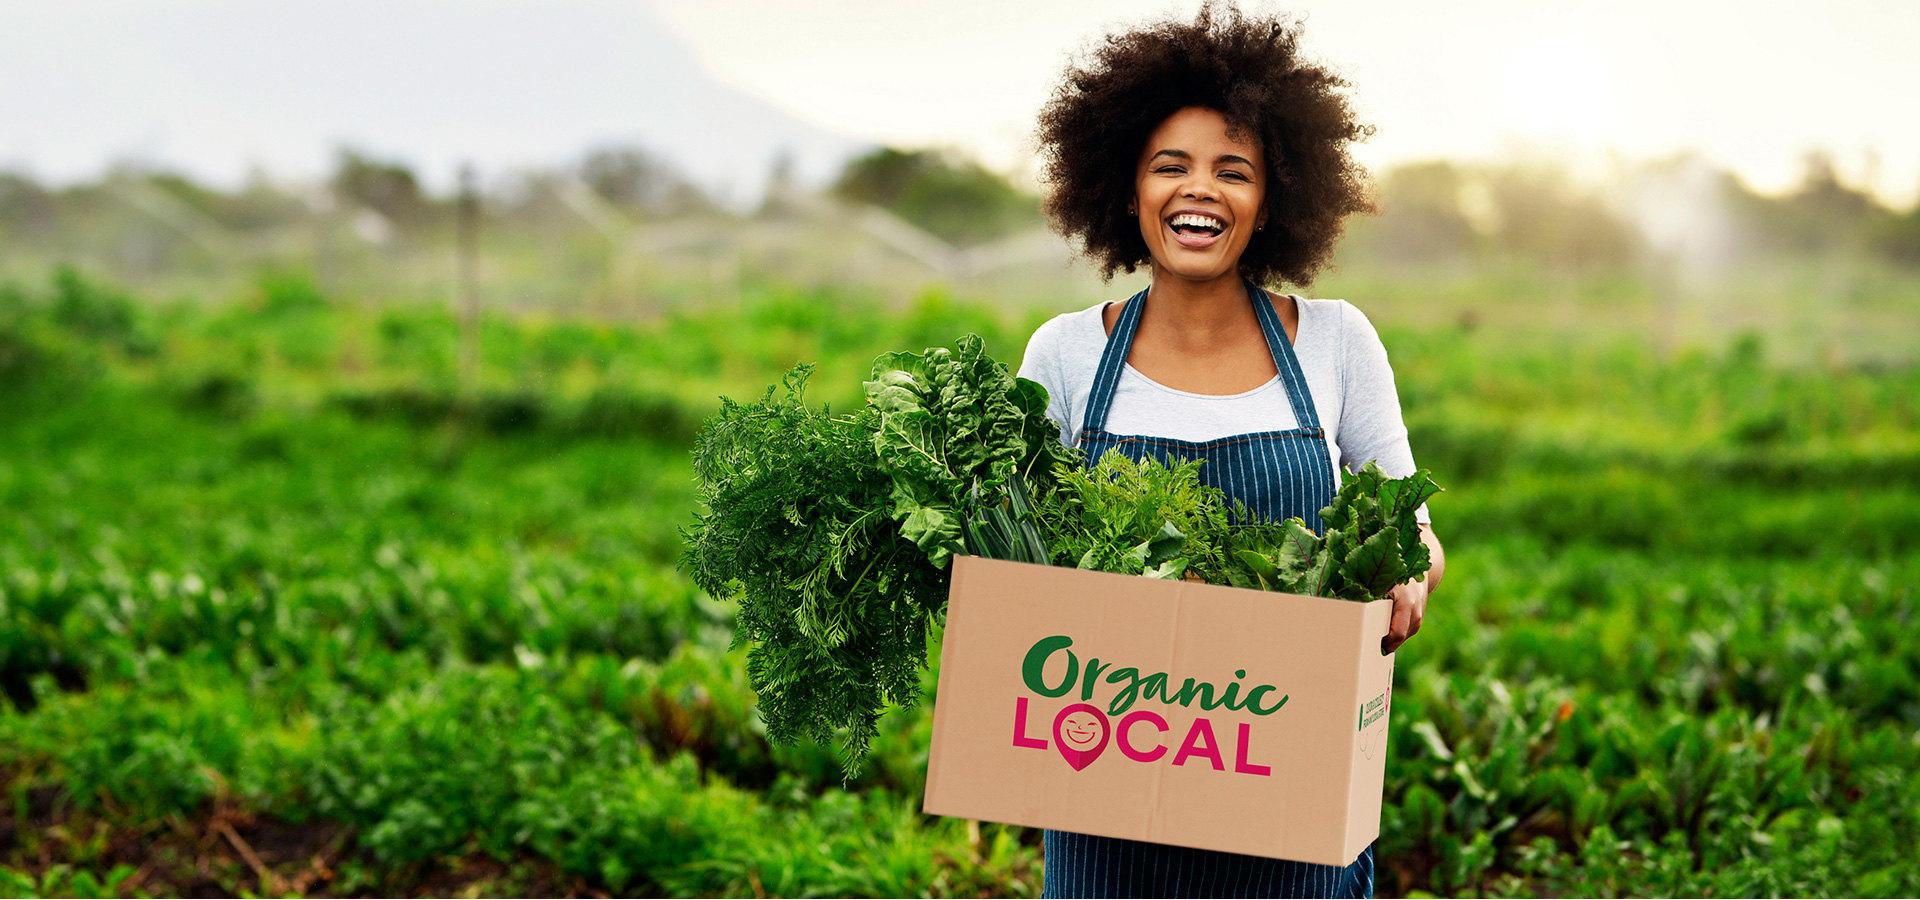 Organics at your local